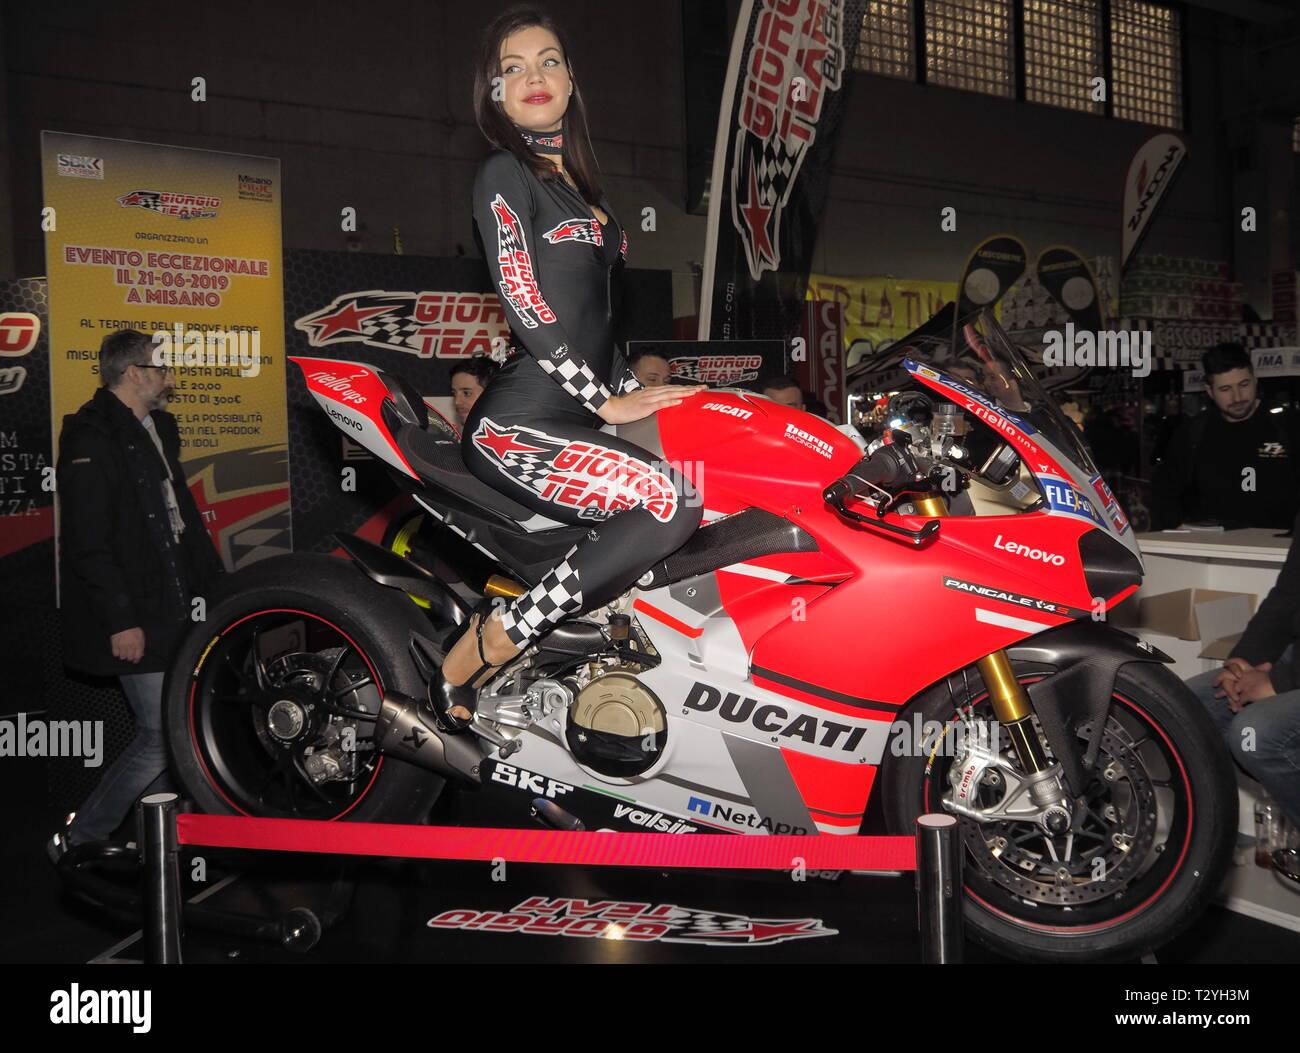 Verona, Italia - 19 de enero de 2019: Motor bike expo Verona, modelo posando en una motocicleta. Imagen De Stock